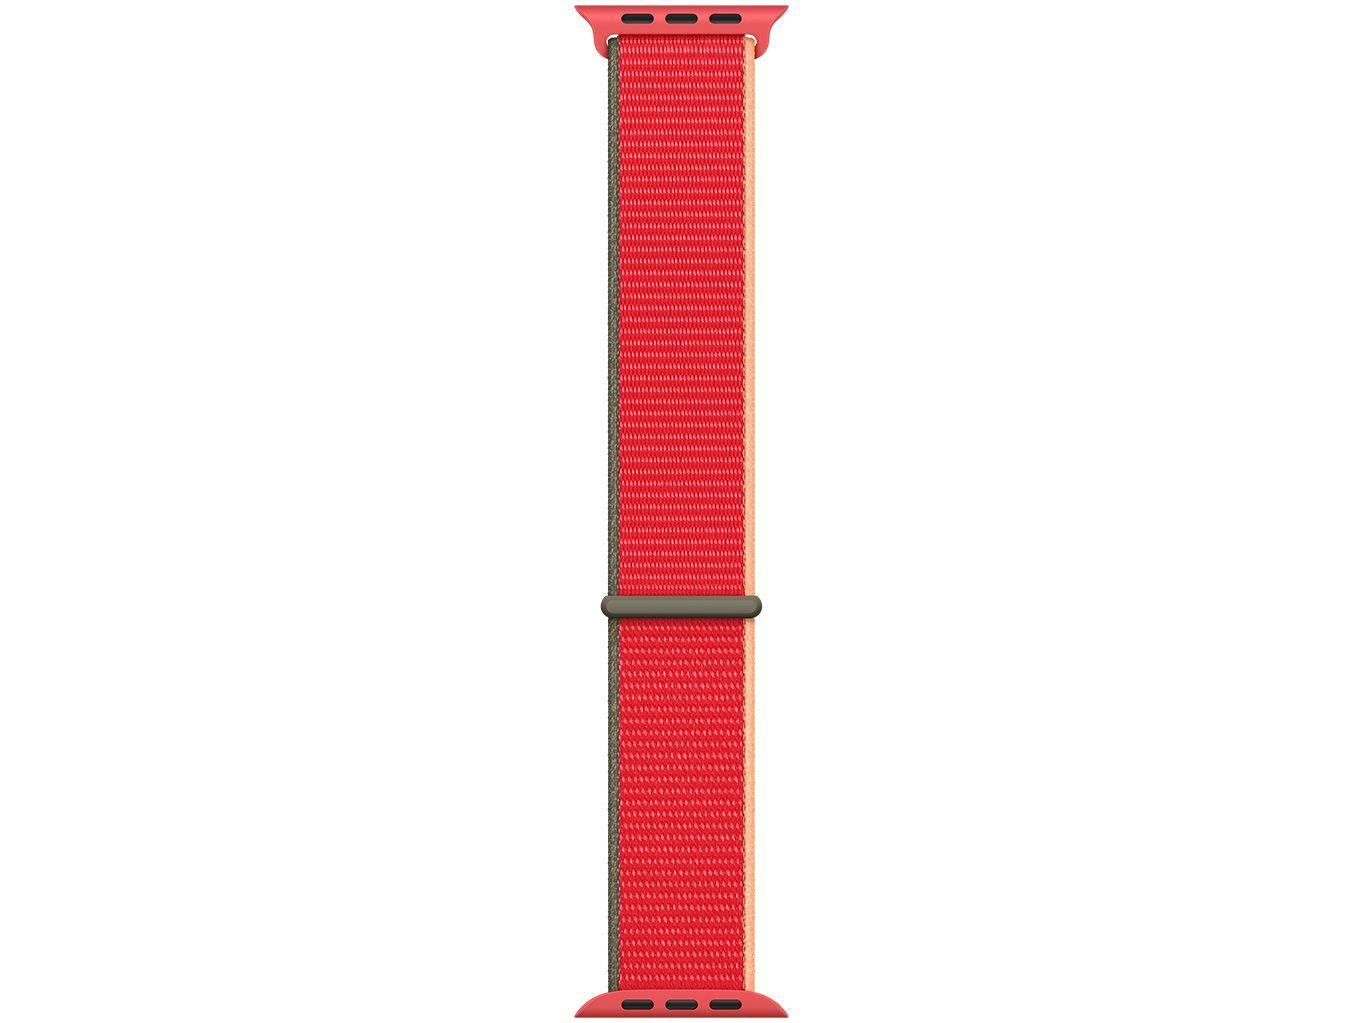 Pulseira Apple Watch Loop Esportiva Apple - 44mm (PRODUCT)RED Original